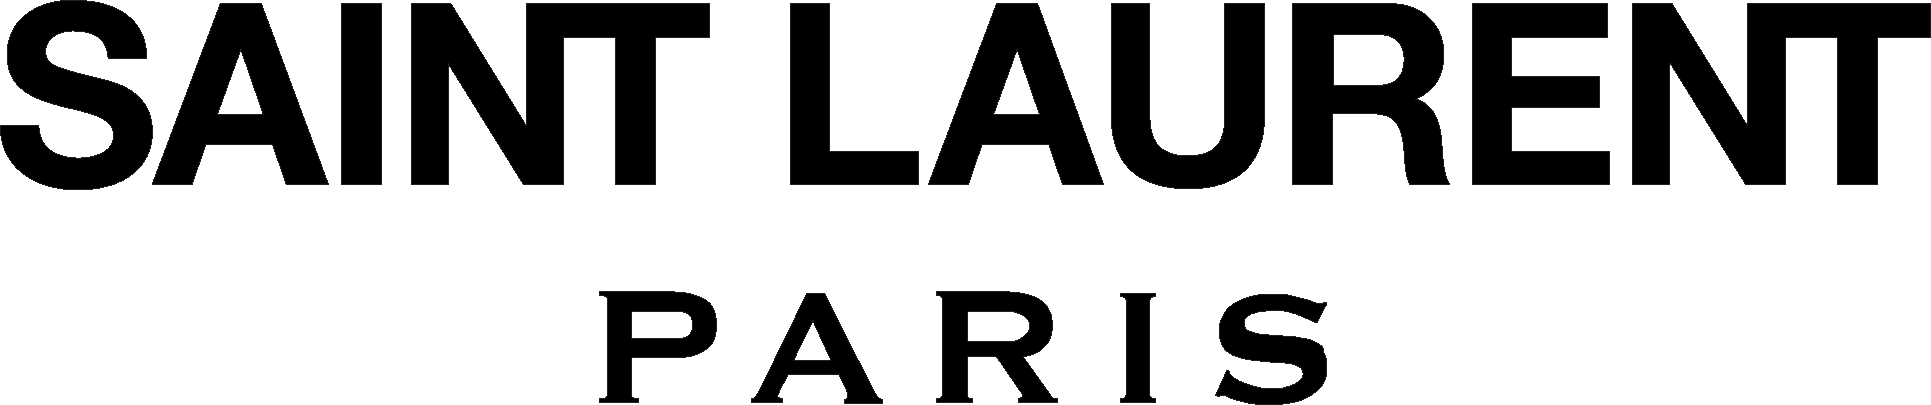 Yves Saint Laurent Sunglasses and Eyeglasses